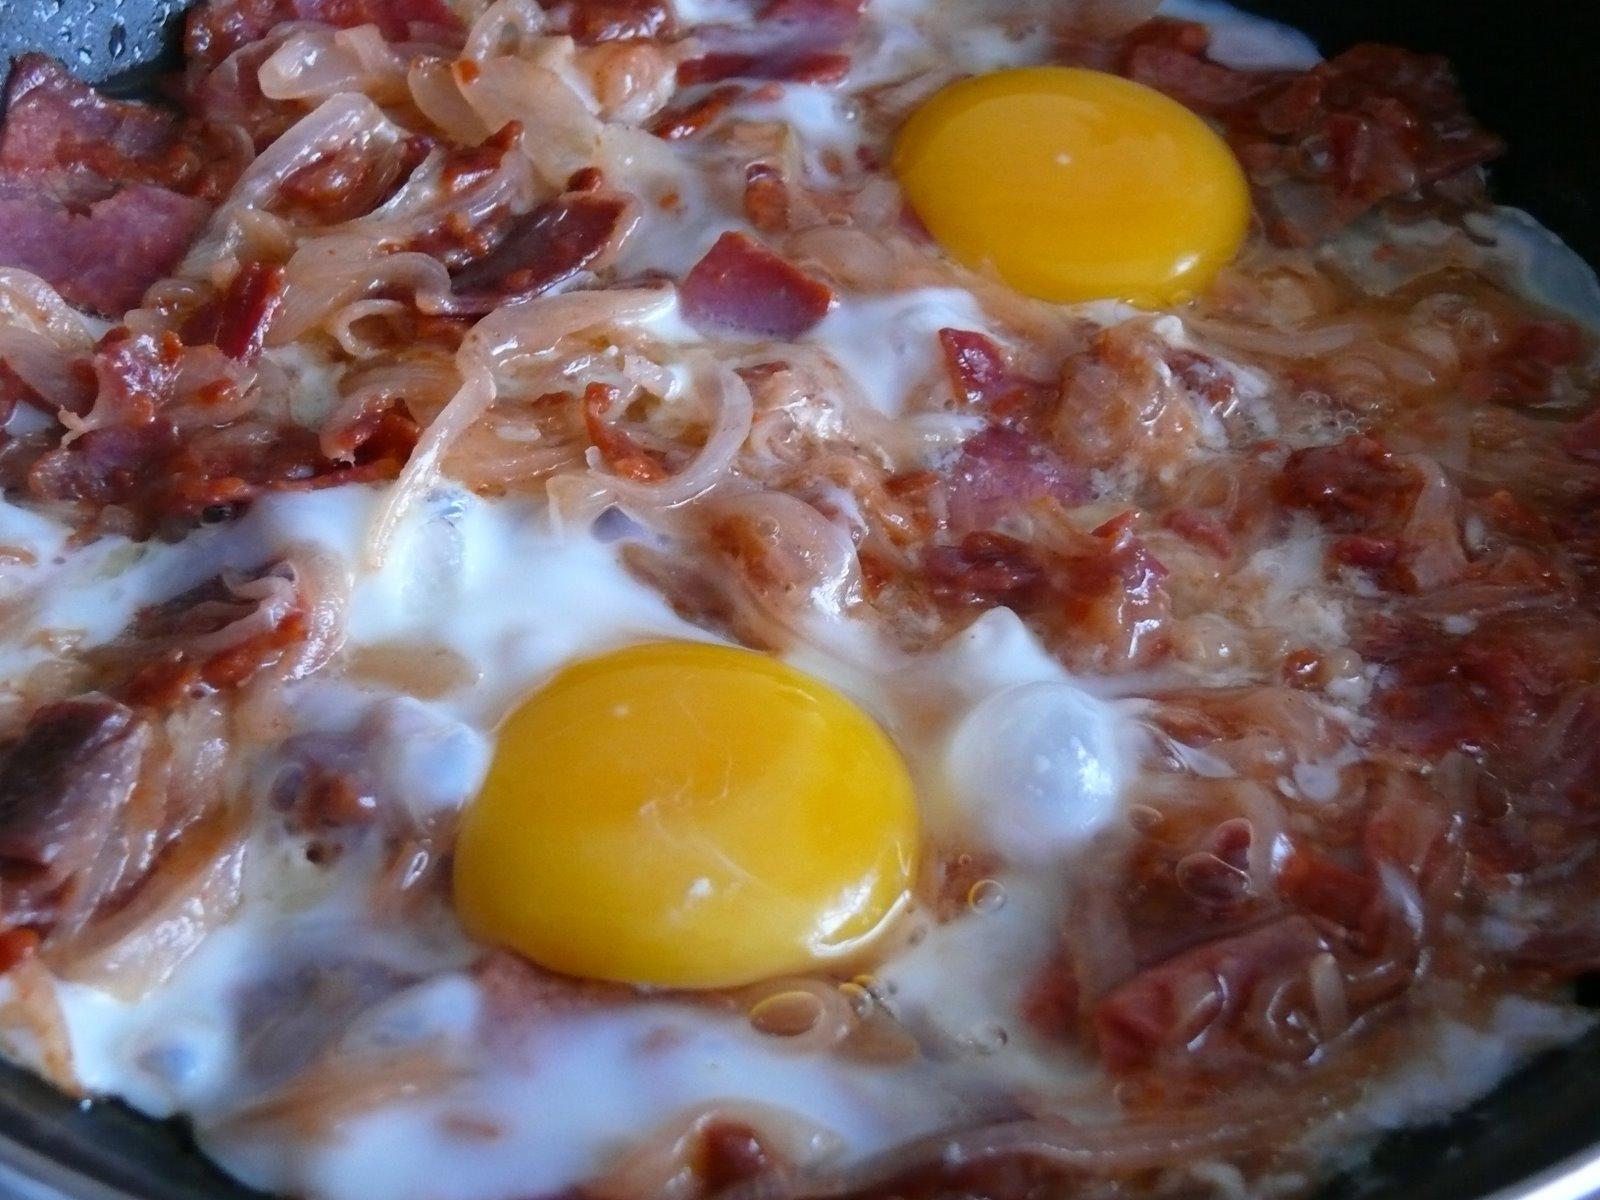 Past�rmal� yumurta tarifi